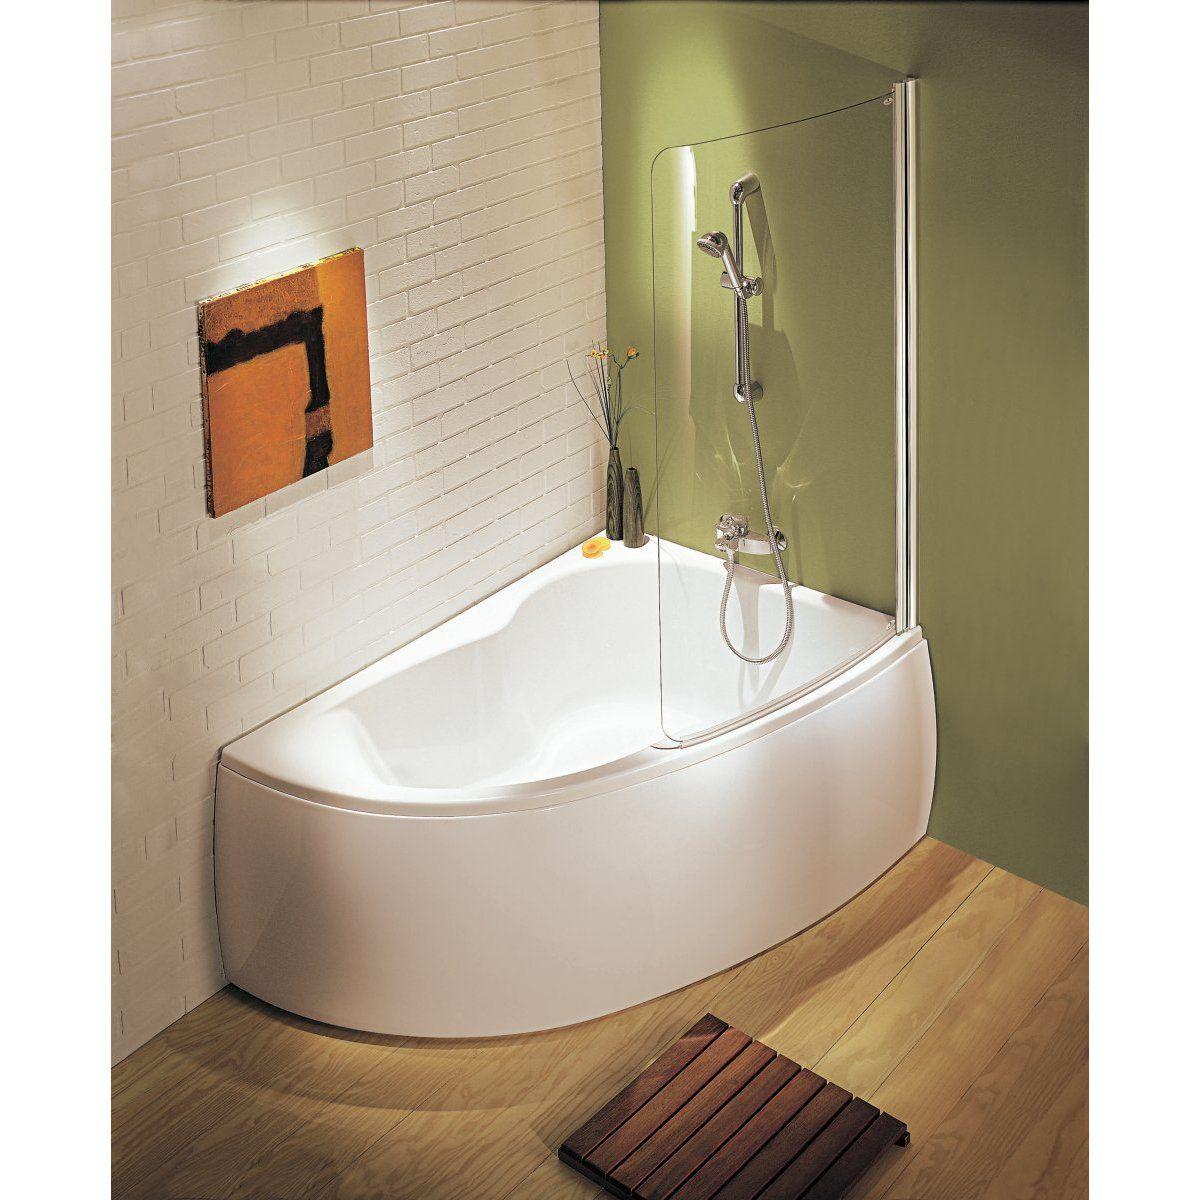 baignoire micromega 150x100 angle droite avec pieds r glables blanc r f e60218 00 maison. Black Bedroom Furniture Sets. Home Design Ideas